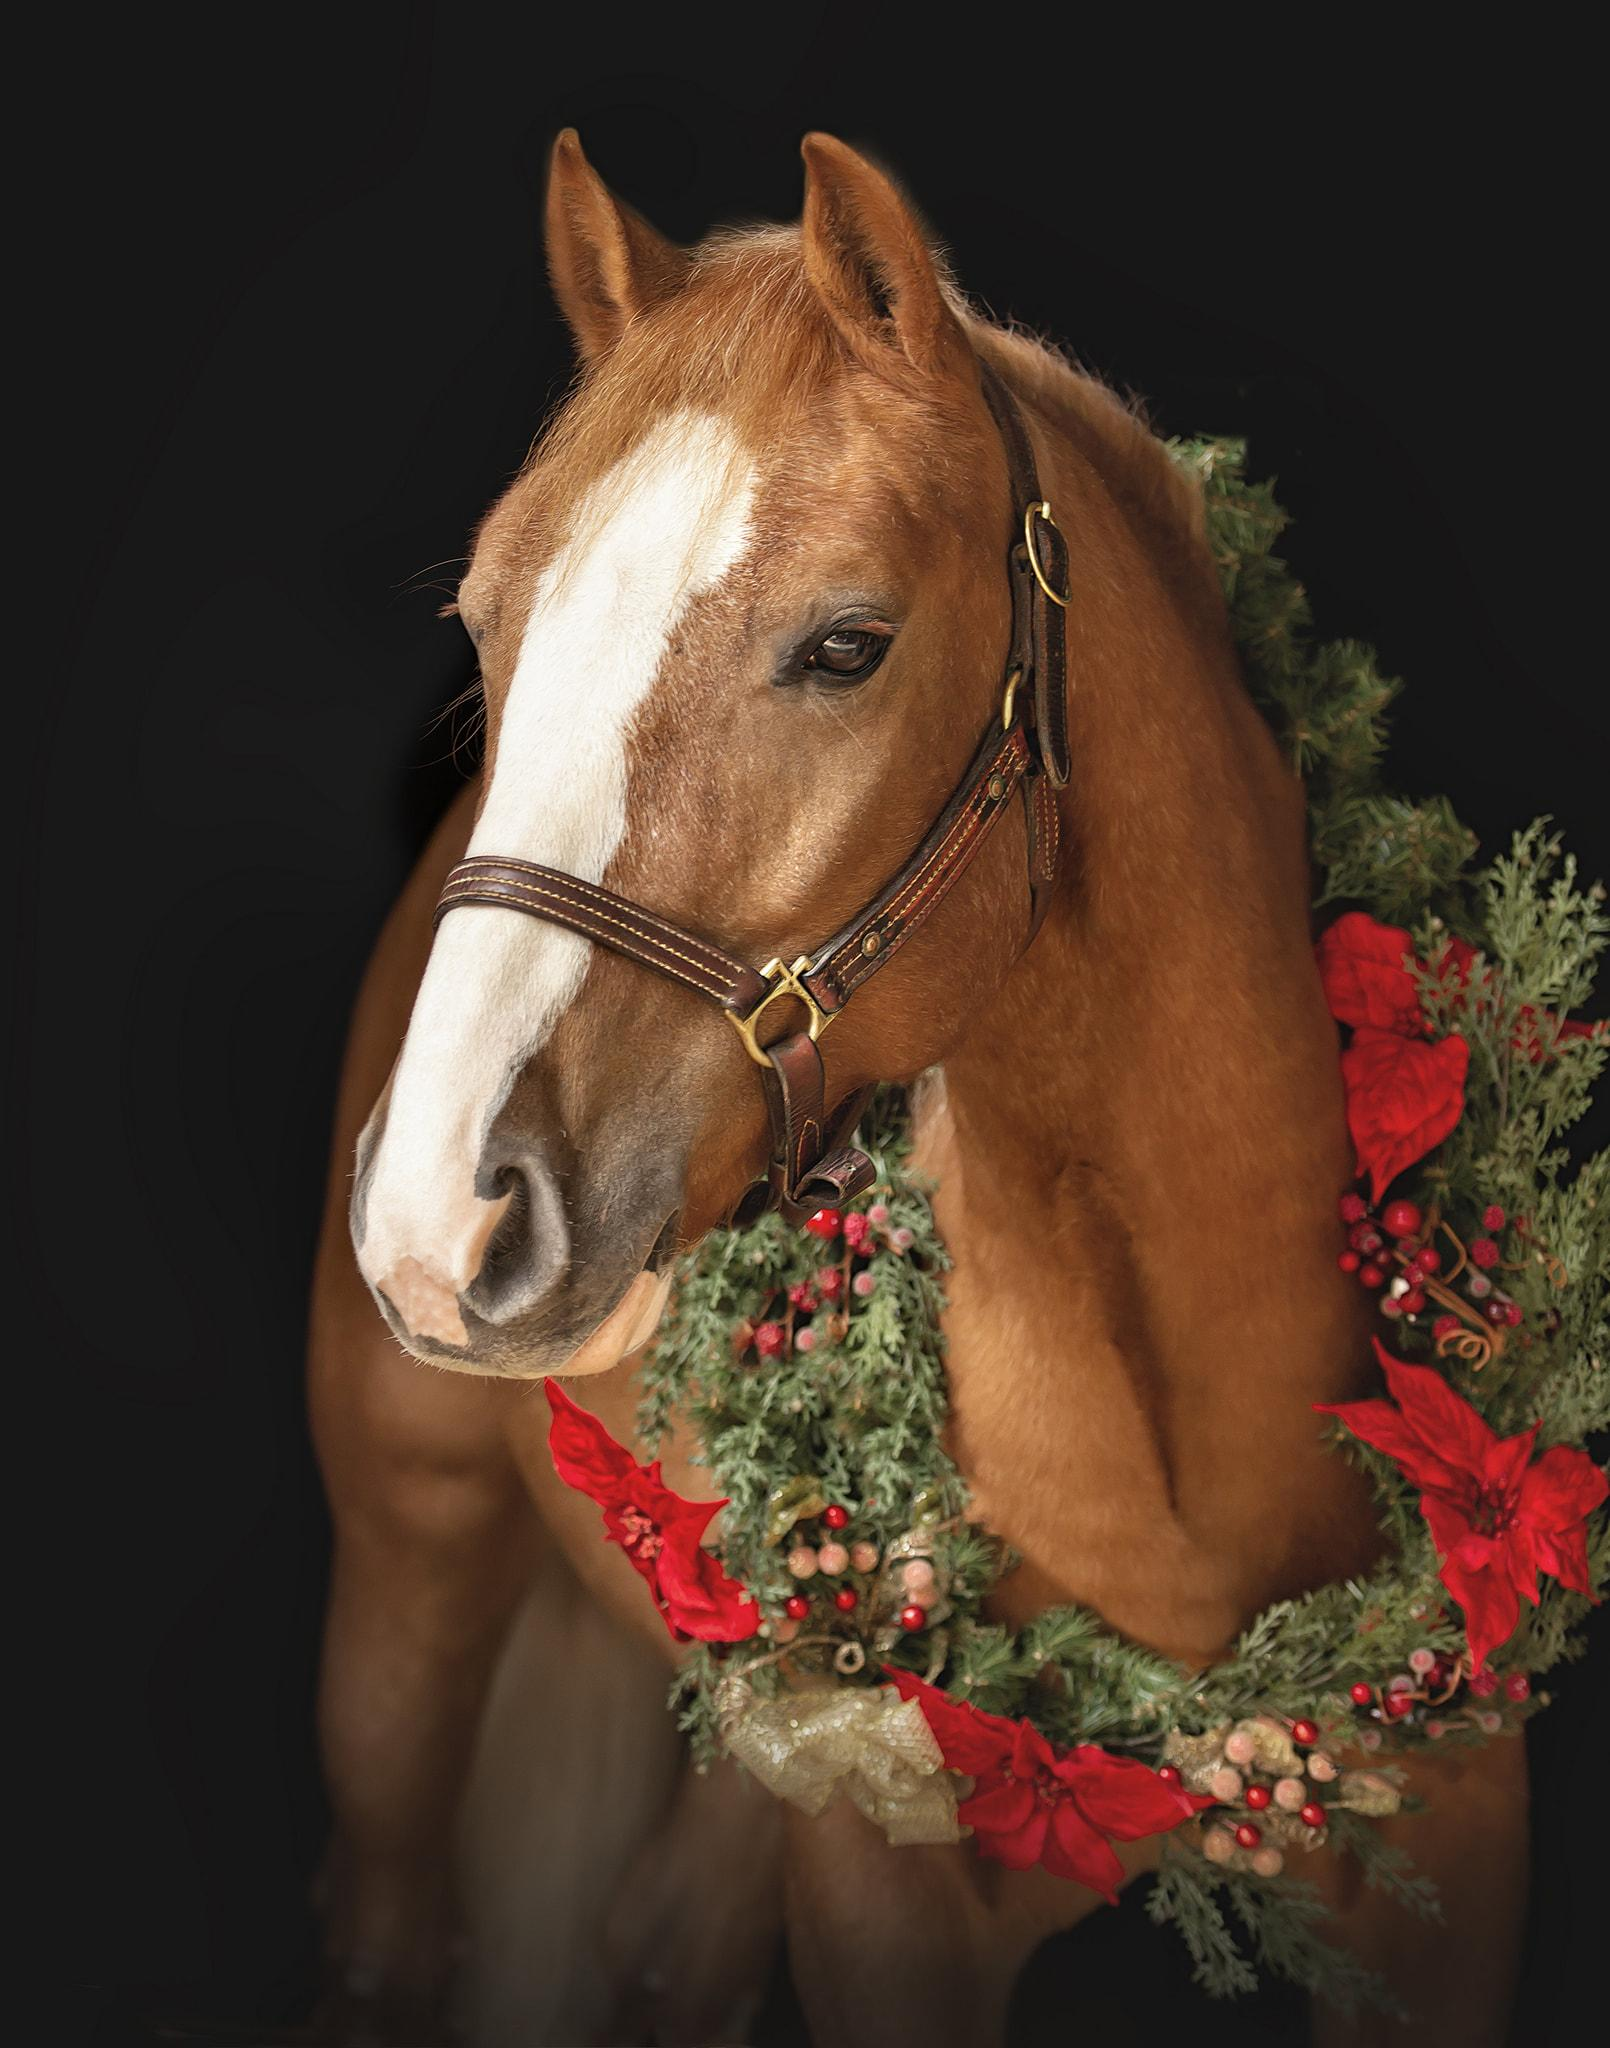 Desafio fotográfico: Boas festas | HORSE NATION 3